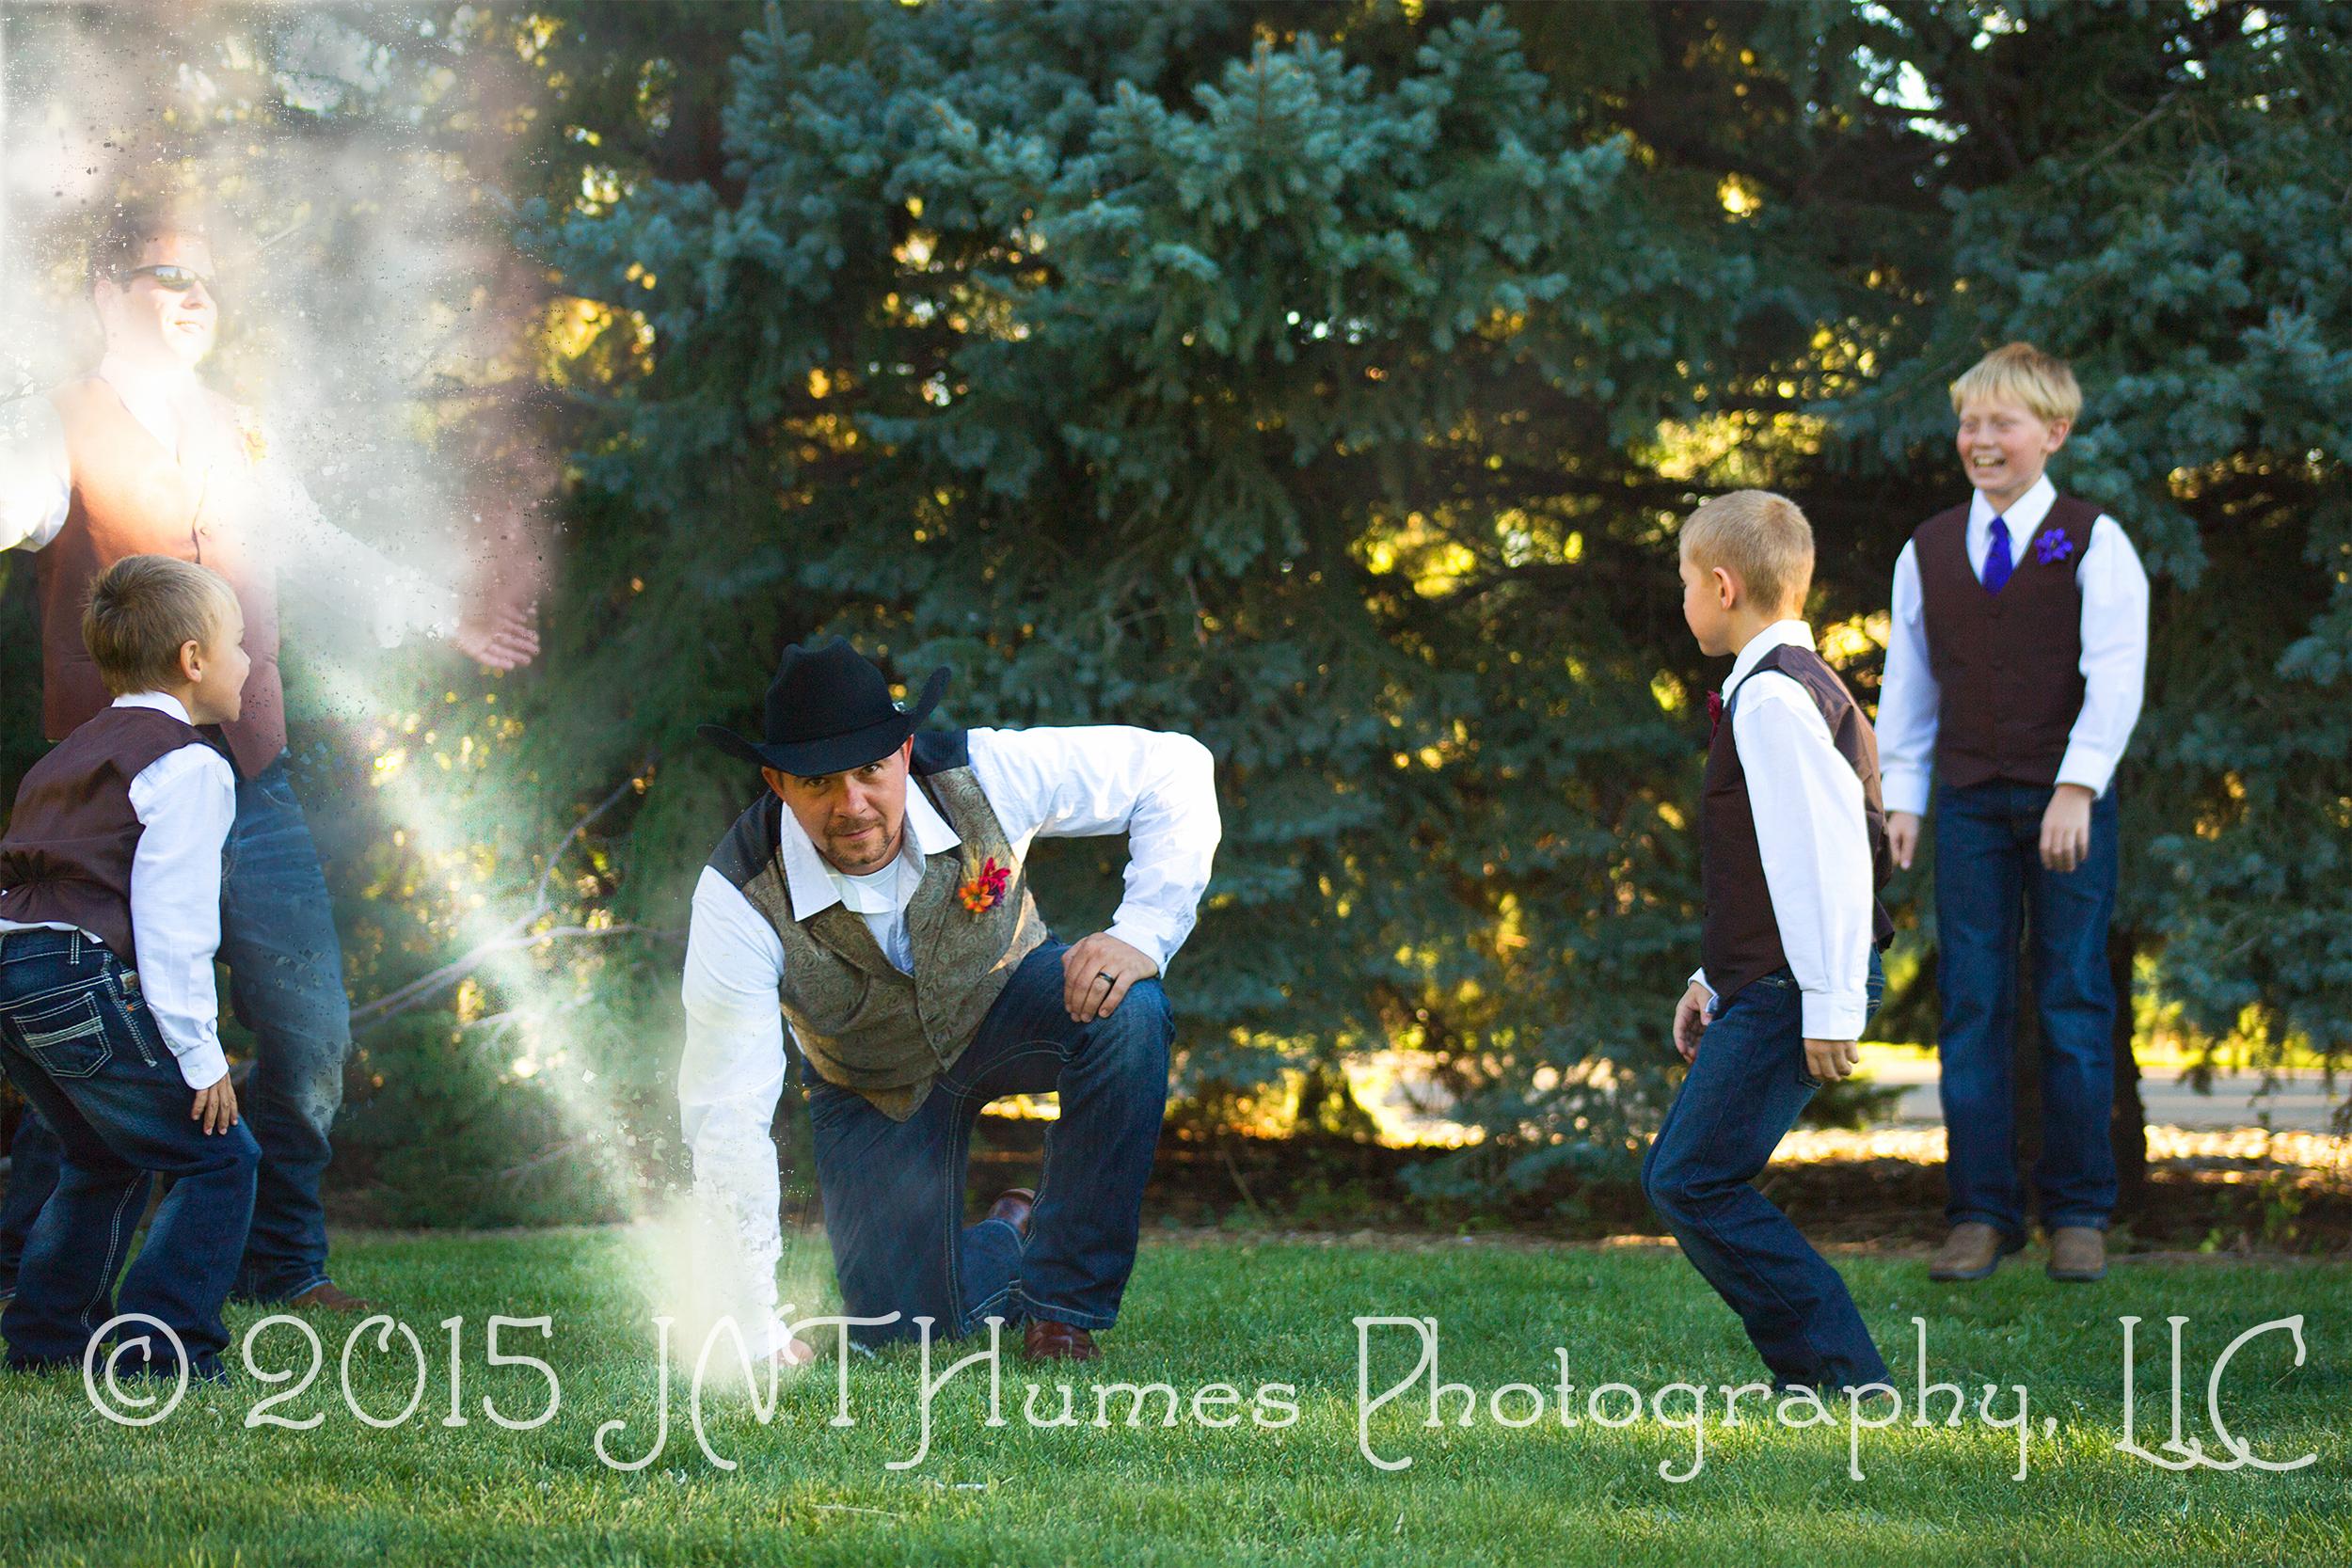 IMG_1770_Rev12015-09-19© 2015 JNT Humes Photography, LLC.jpg